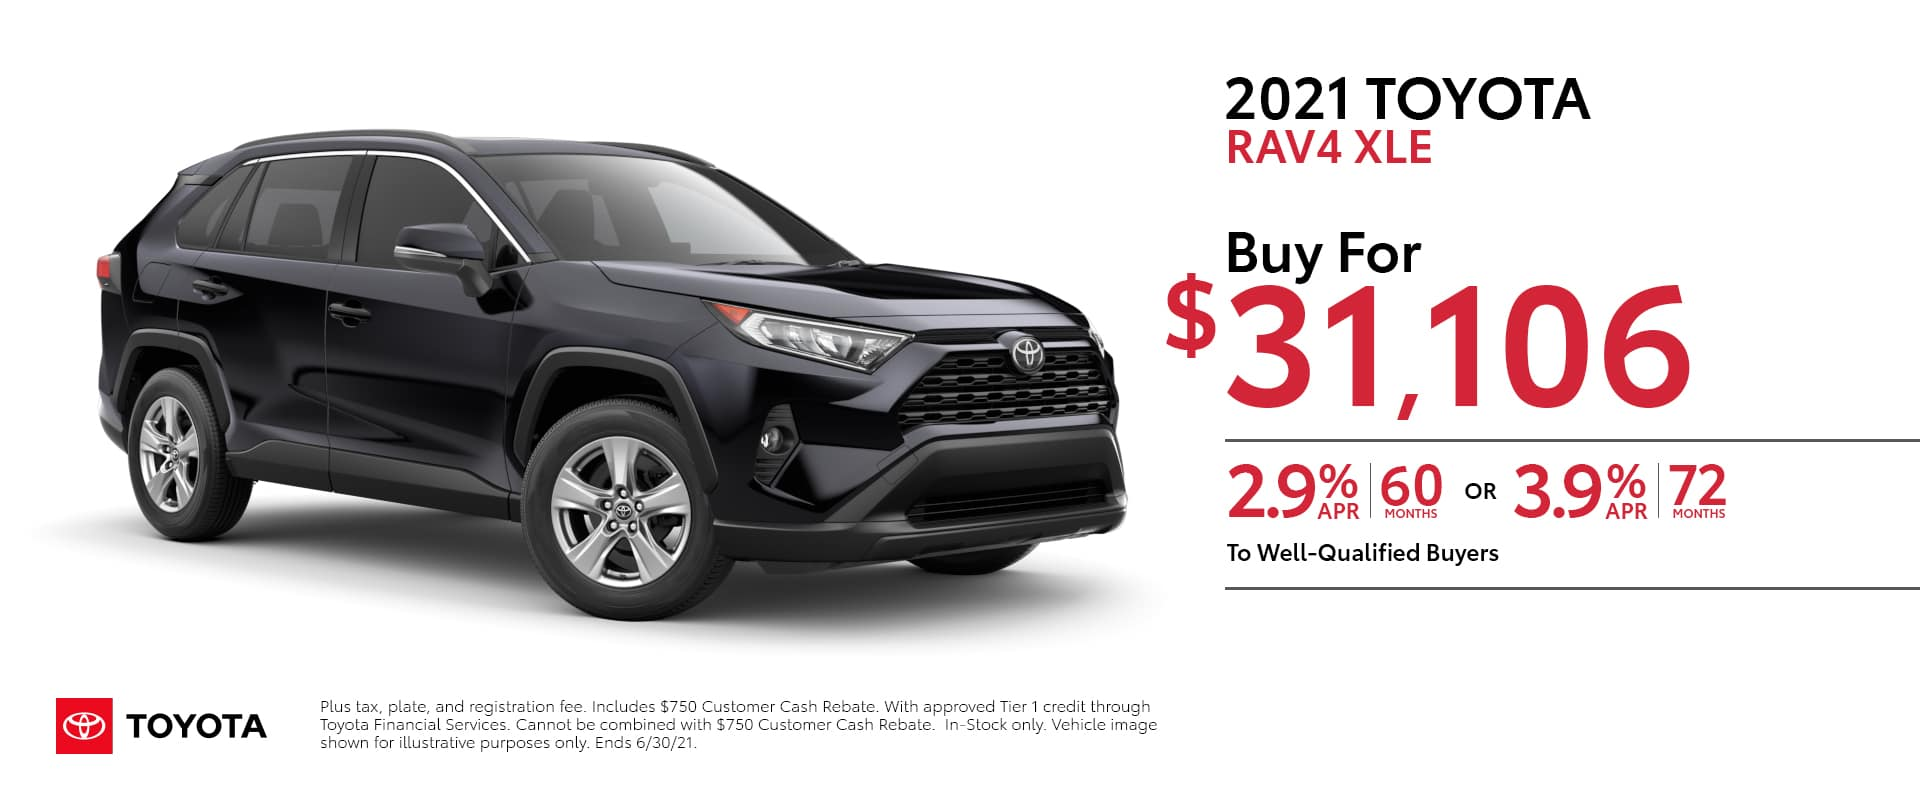 2021-Toyota-Rav4-LE-AWD-APR